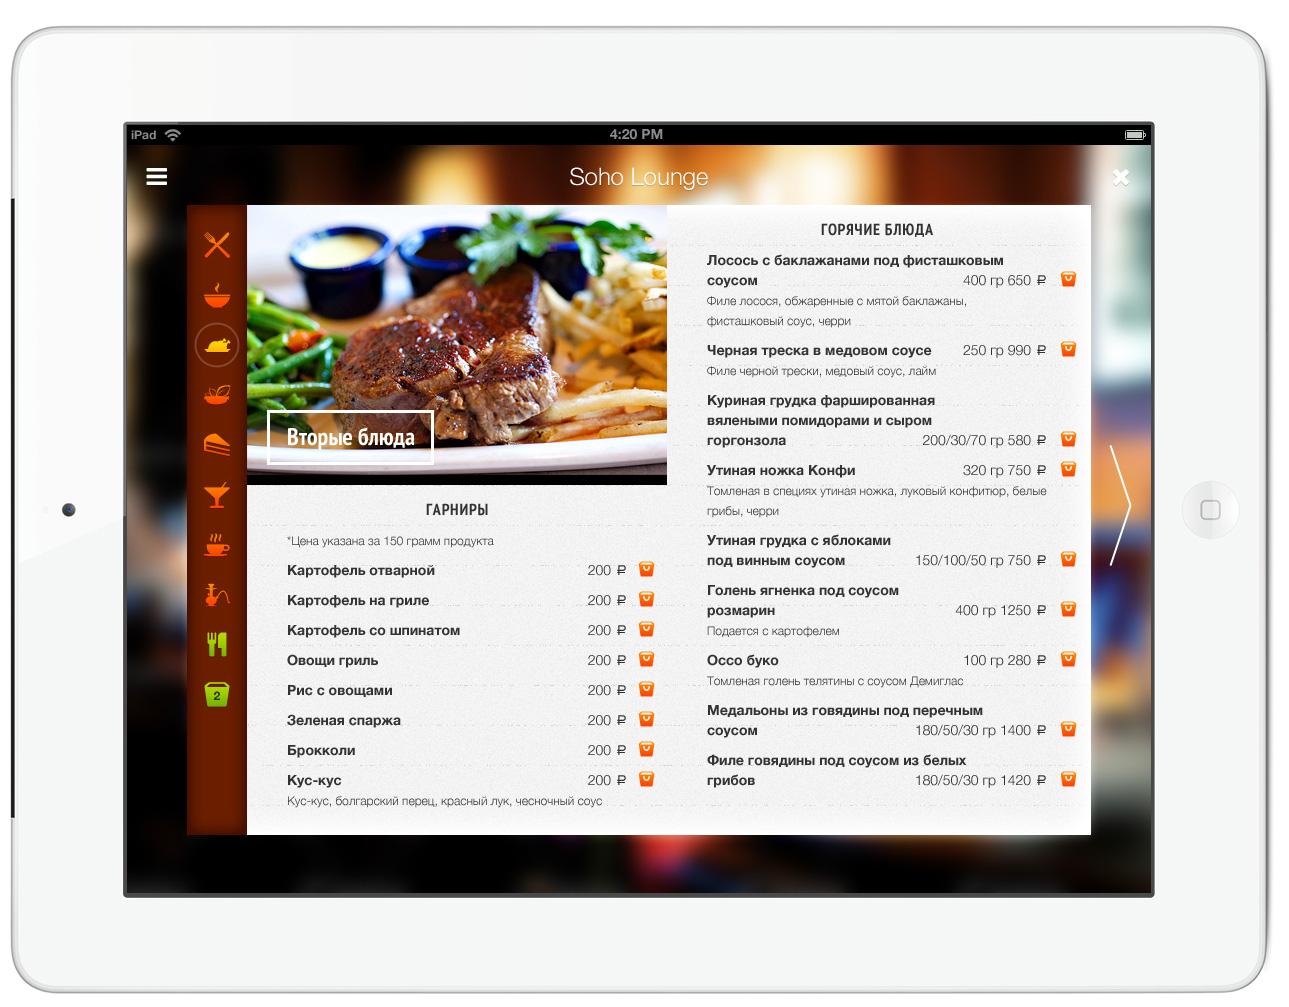 lafamilia_restaurant_menu.jpg